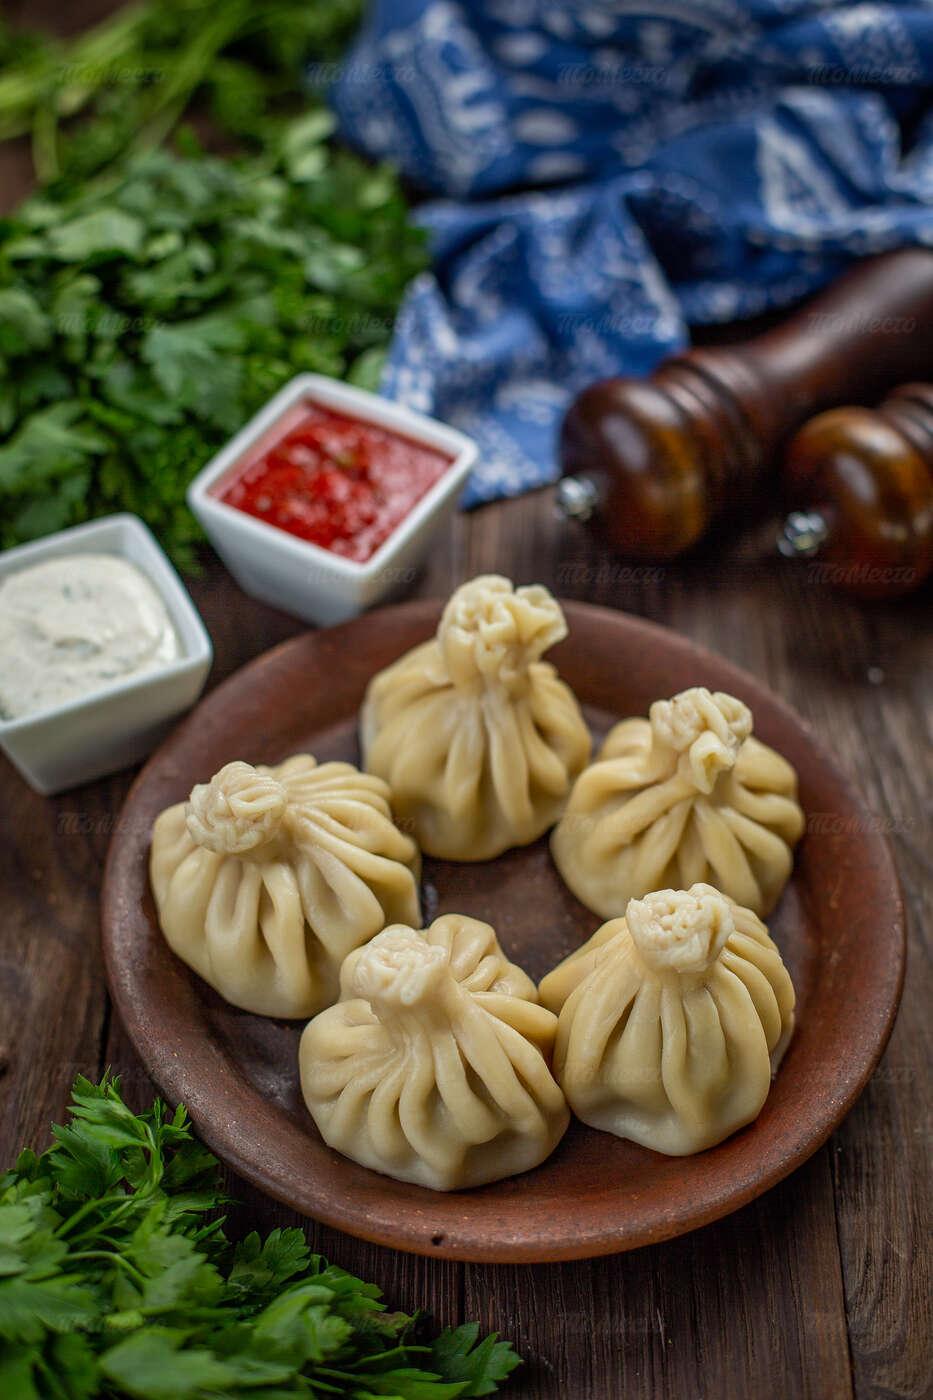 Меню кафе Хинкали & Хачапури на Льва Толстого фото 3